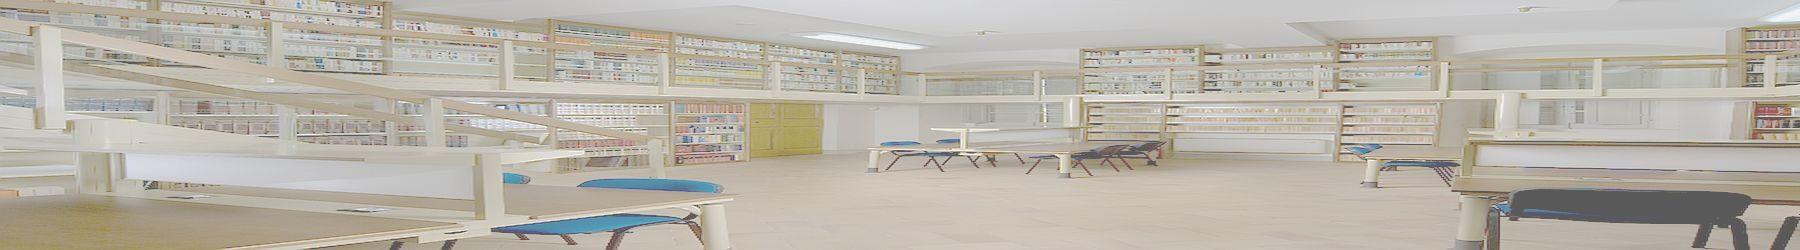 Biblioteca Lodovico Jacobilli